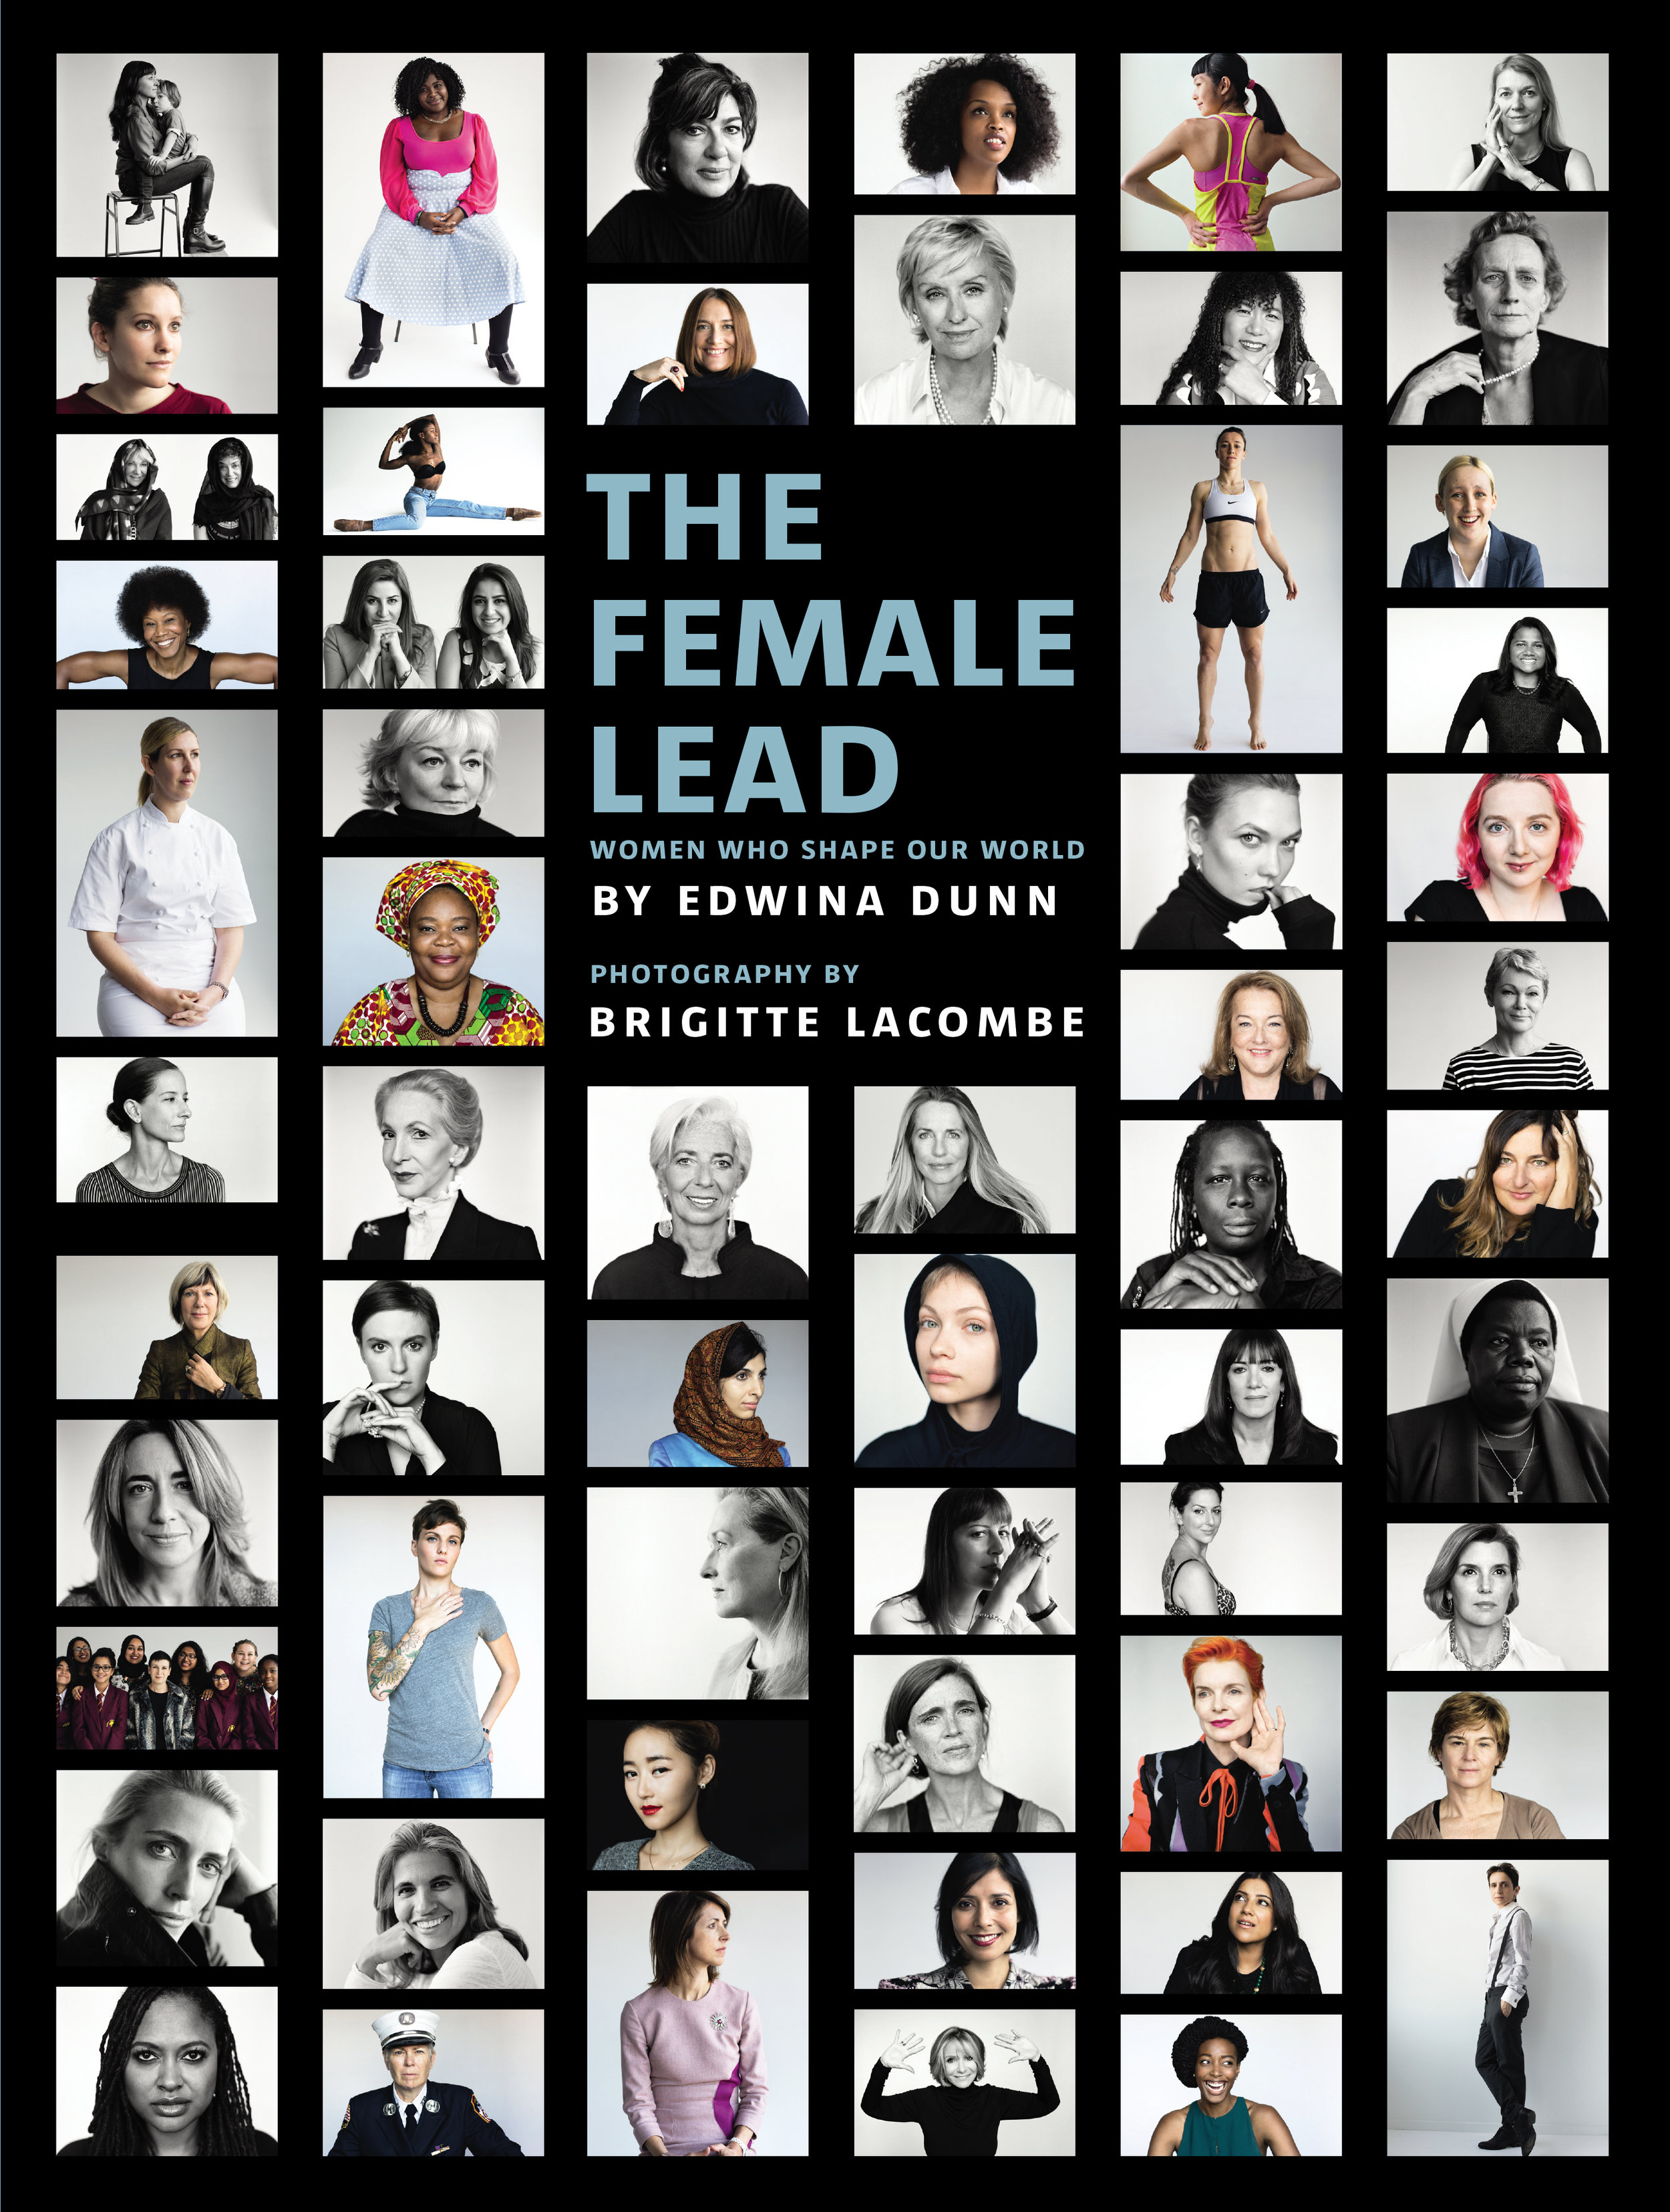 The Female Lead